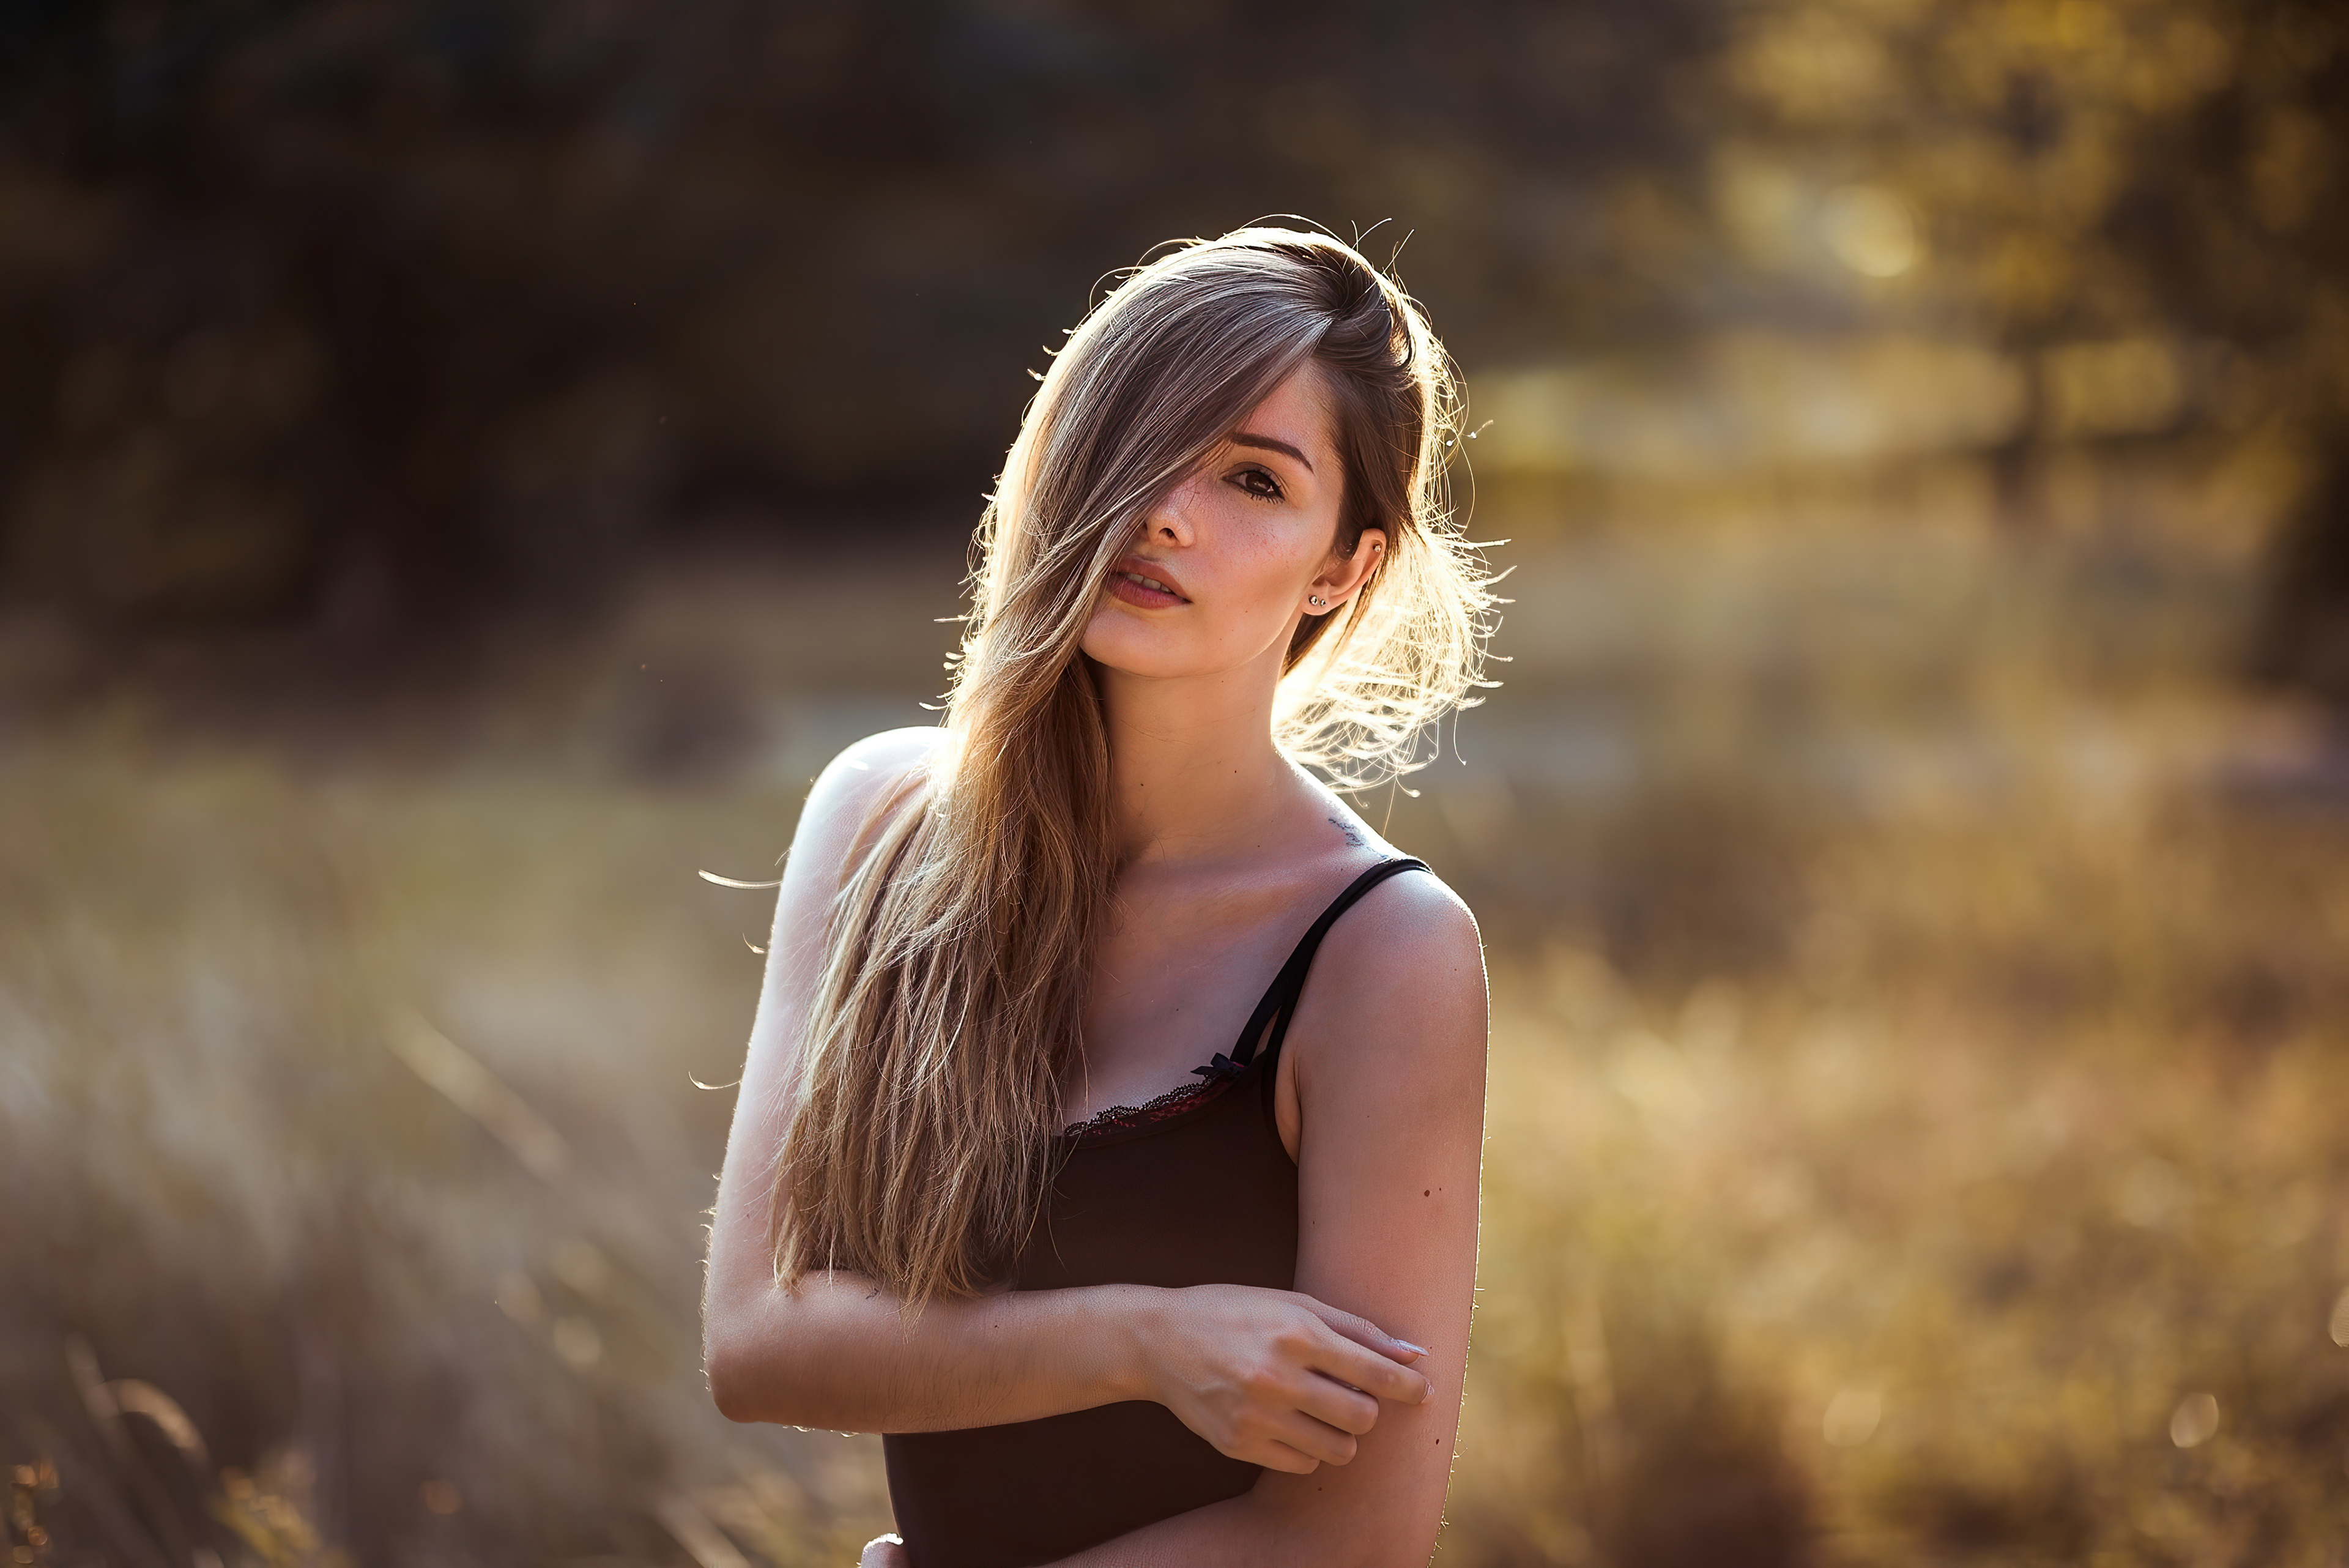 blonde women outdoor 1596916215 - Blonde Women Outdoor -